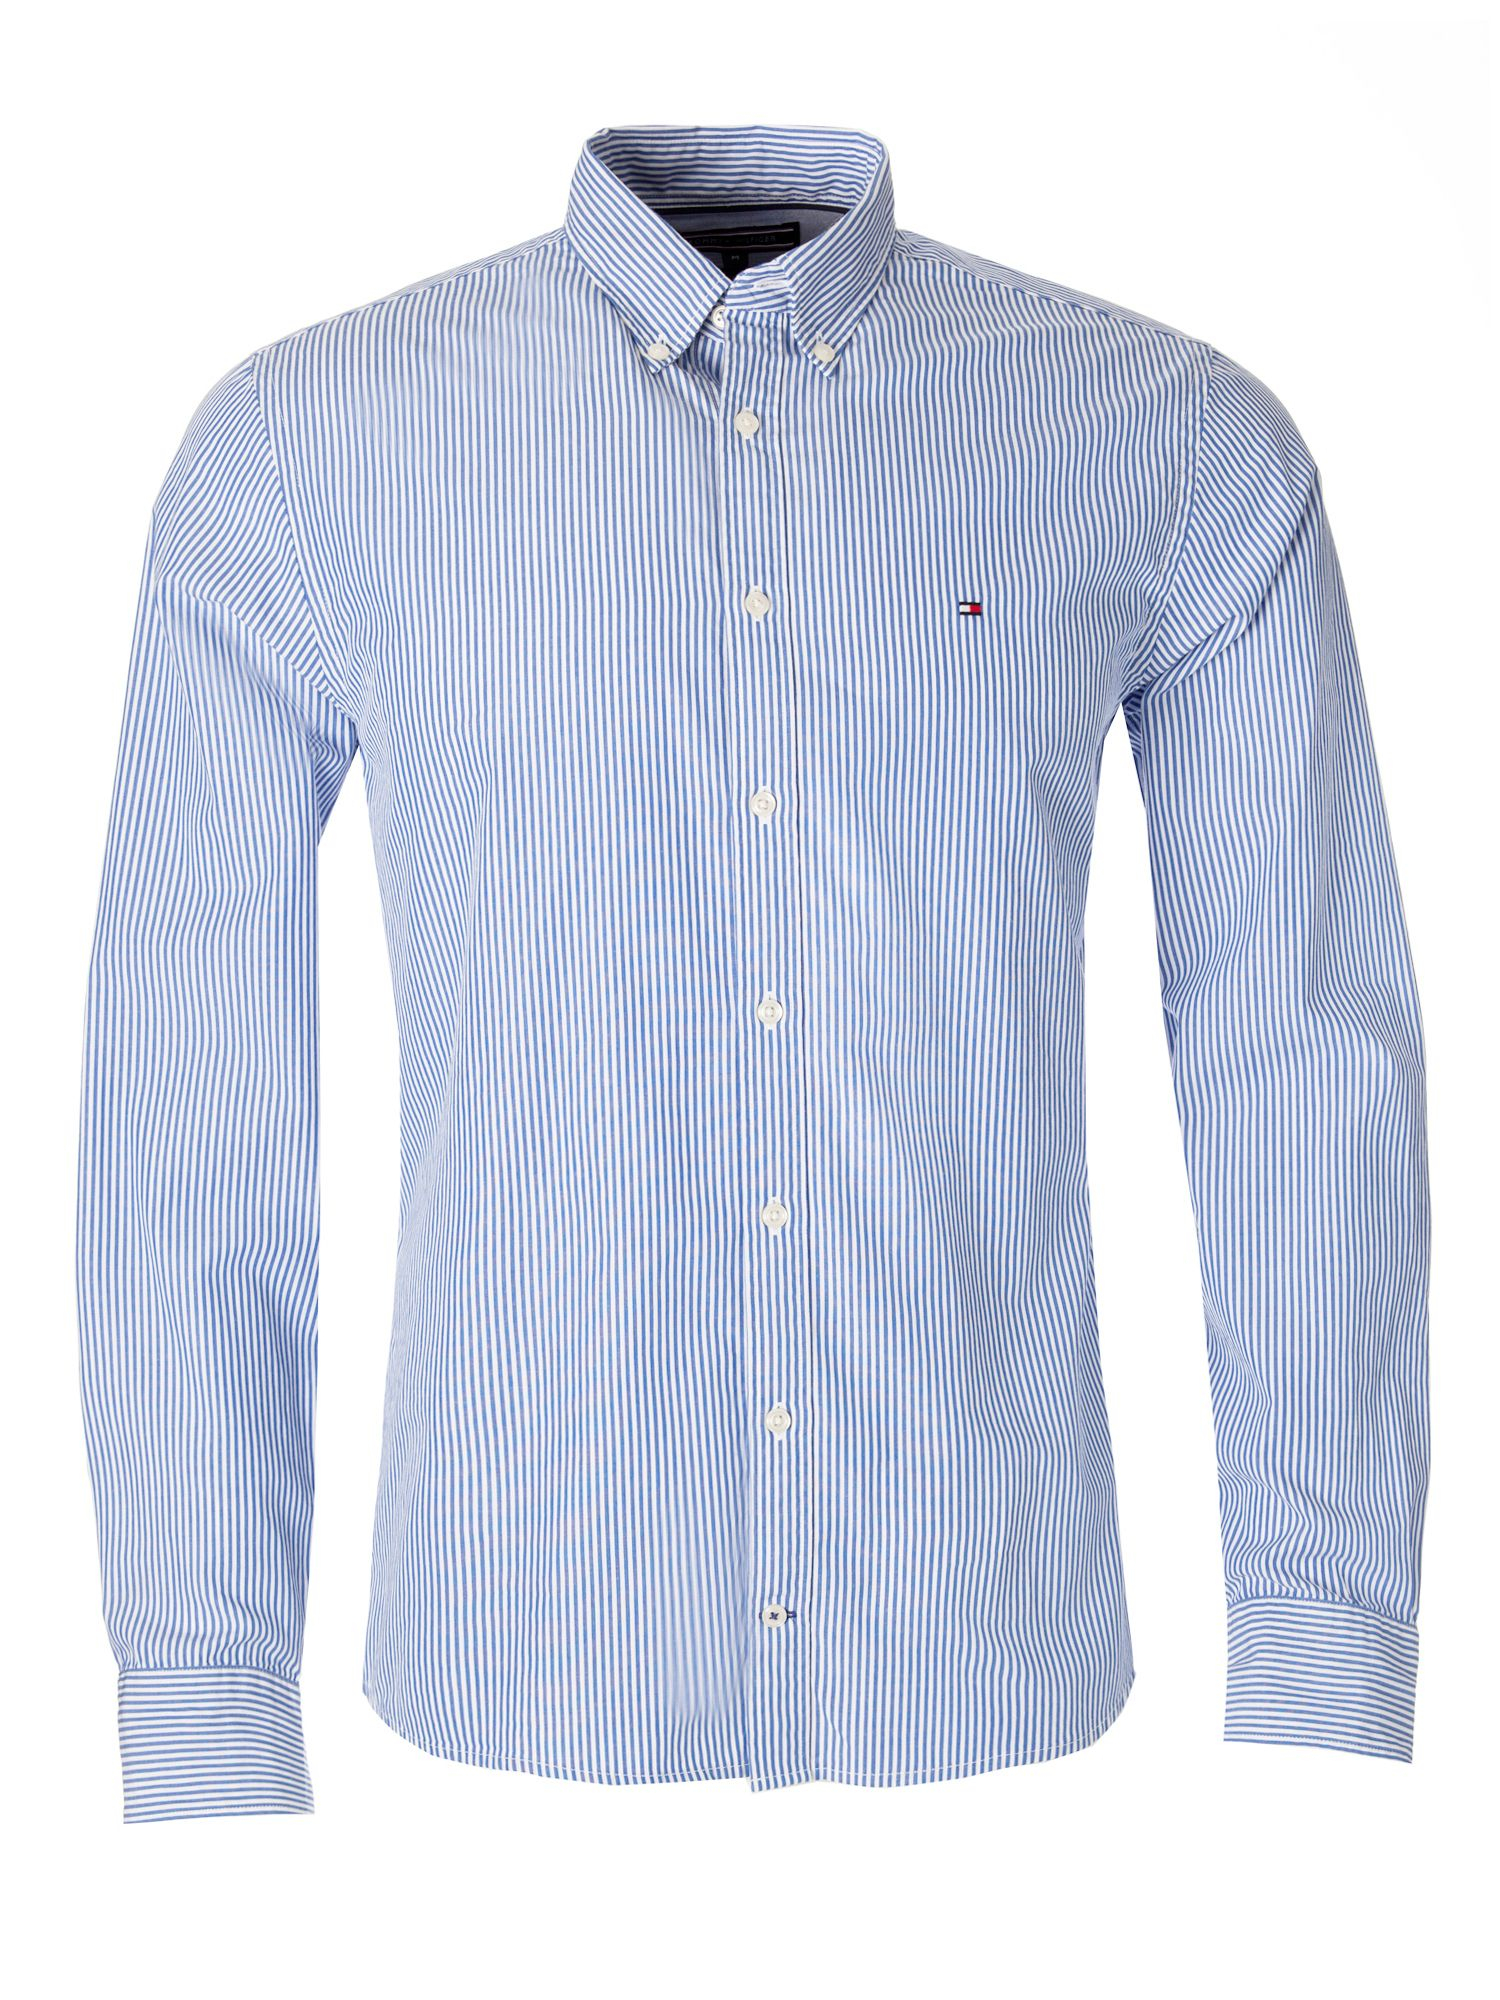 Tommy hilfiger ivy stripe shirt in blue for men lyst for Tommy hilfiger fitzgerald striped shirt